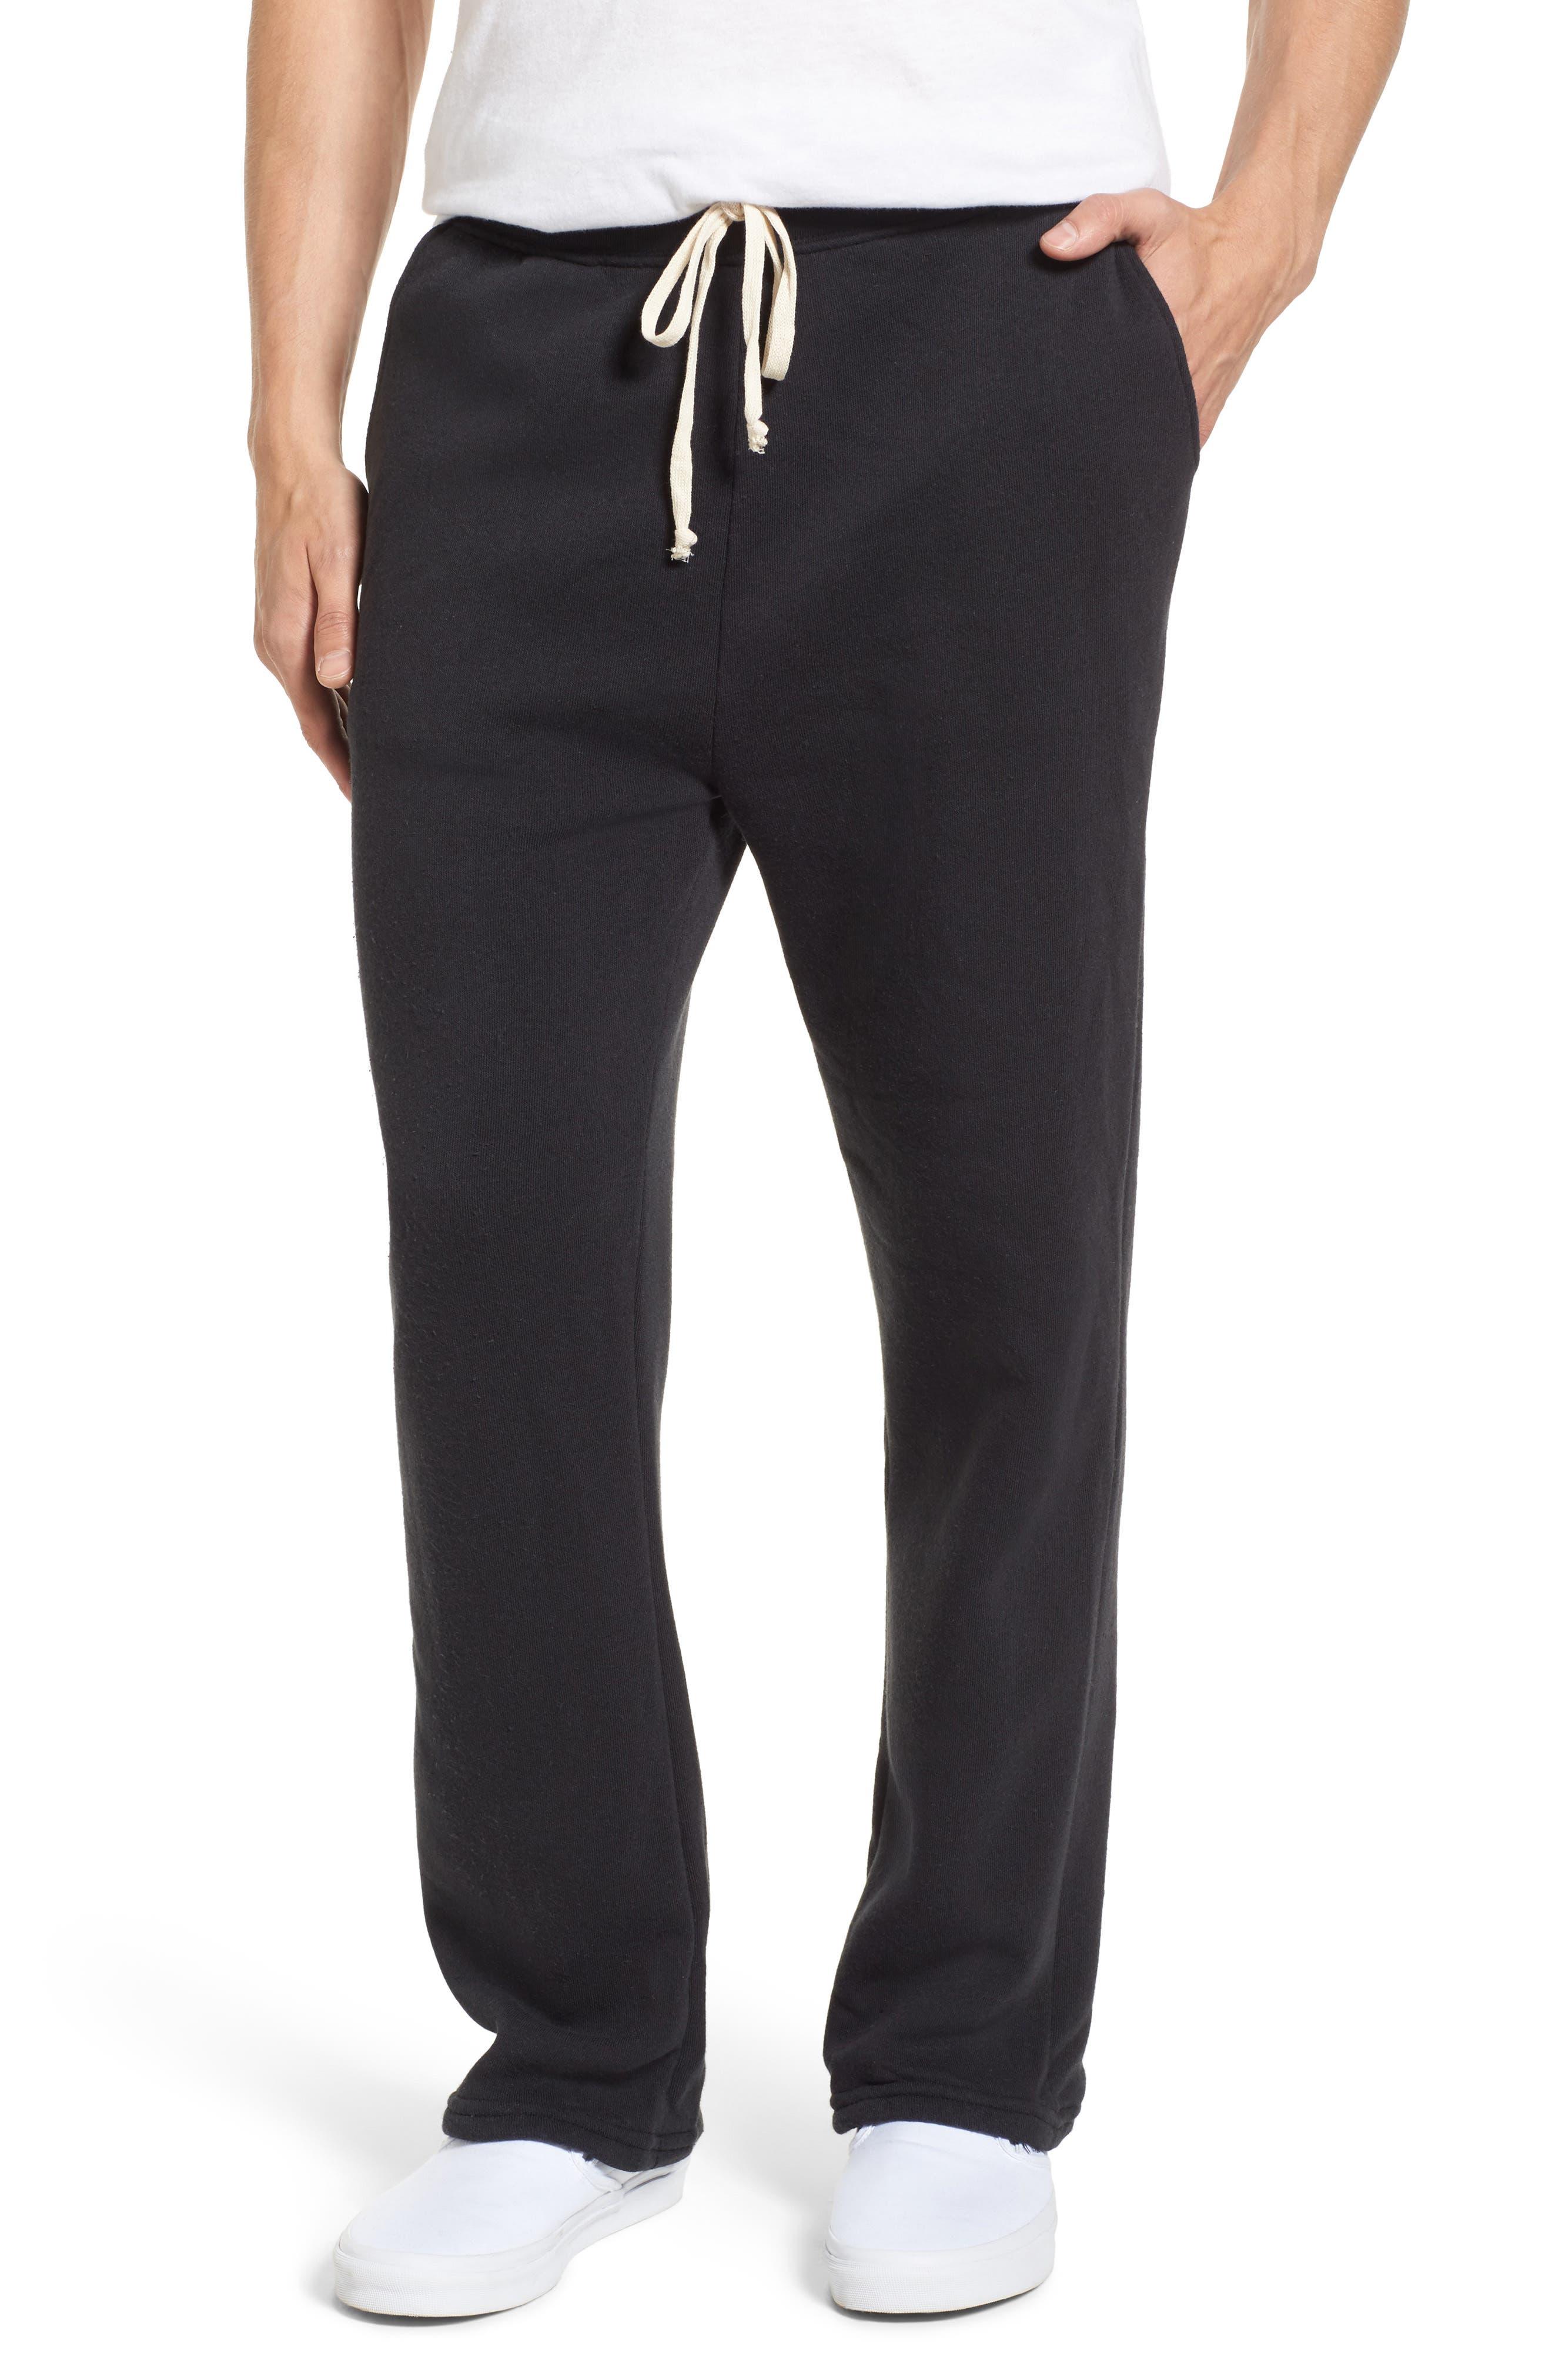 'The Hustle' Sweatpants,                         Main,                         color,